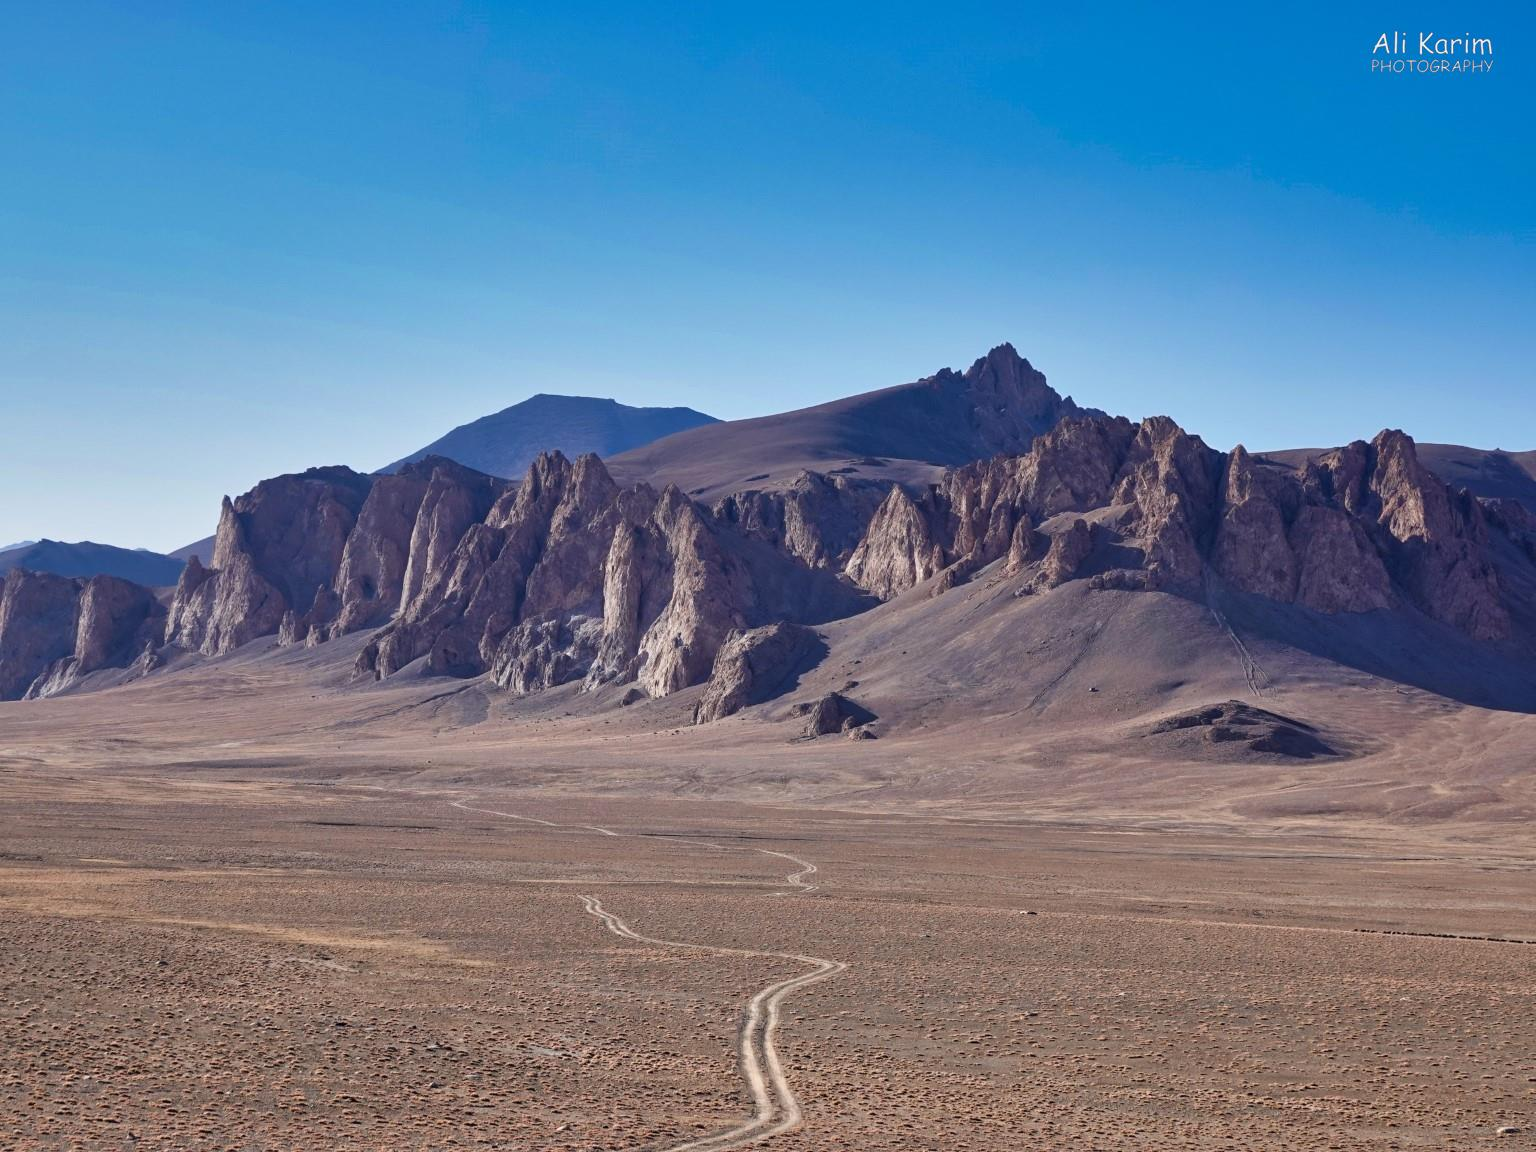 More Murghab & Alichur, Tajikistan, Nothingness everywhere